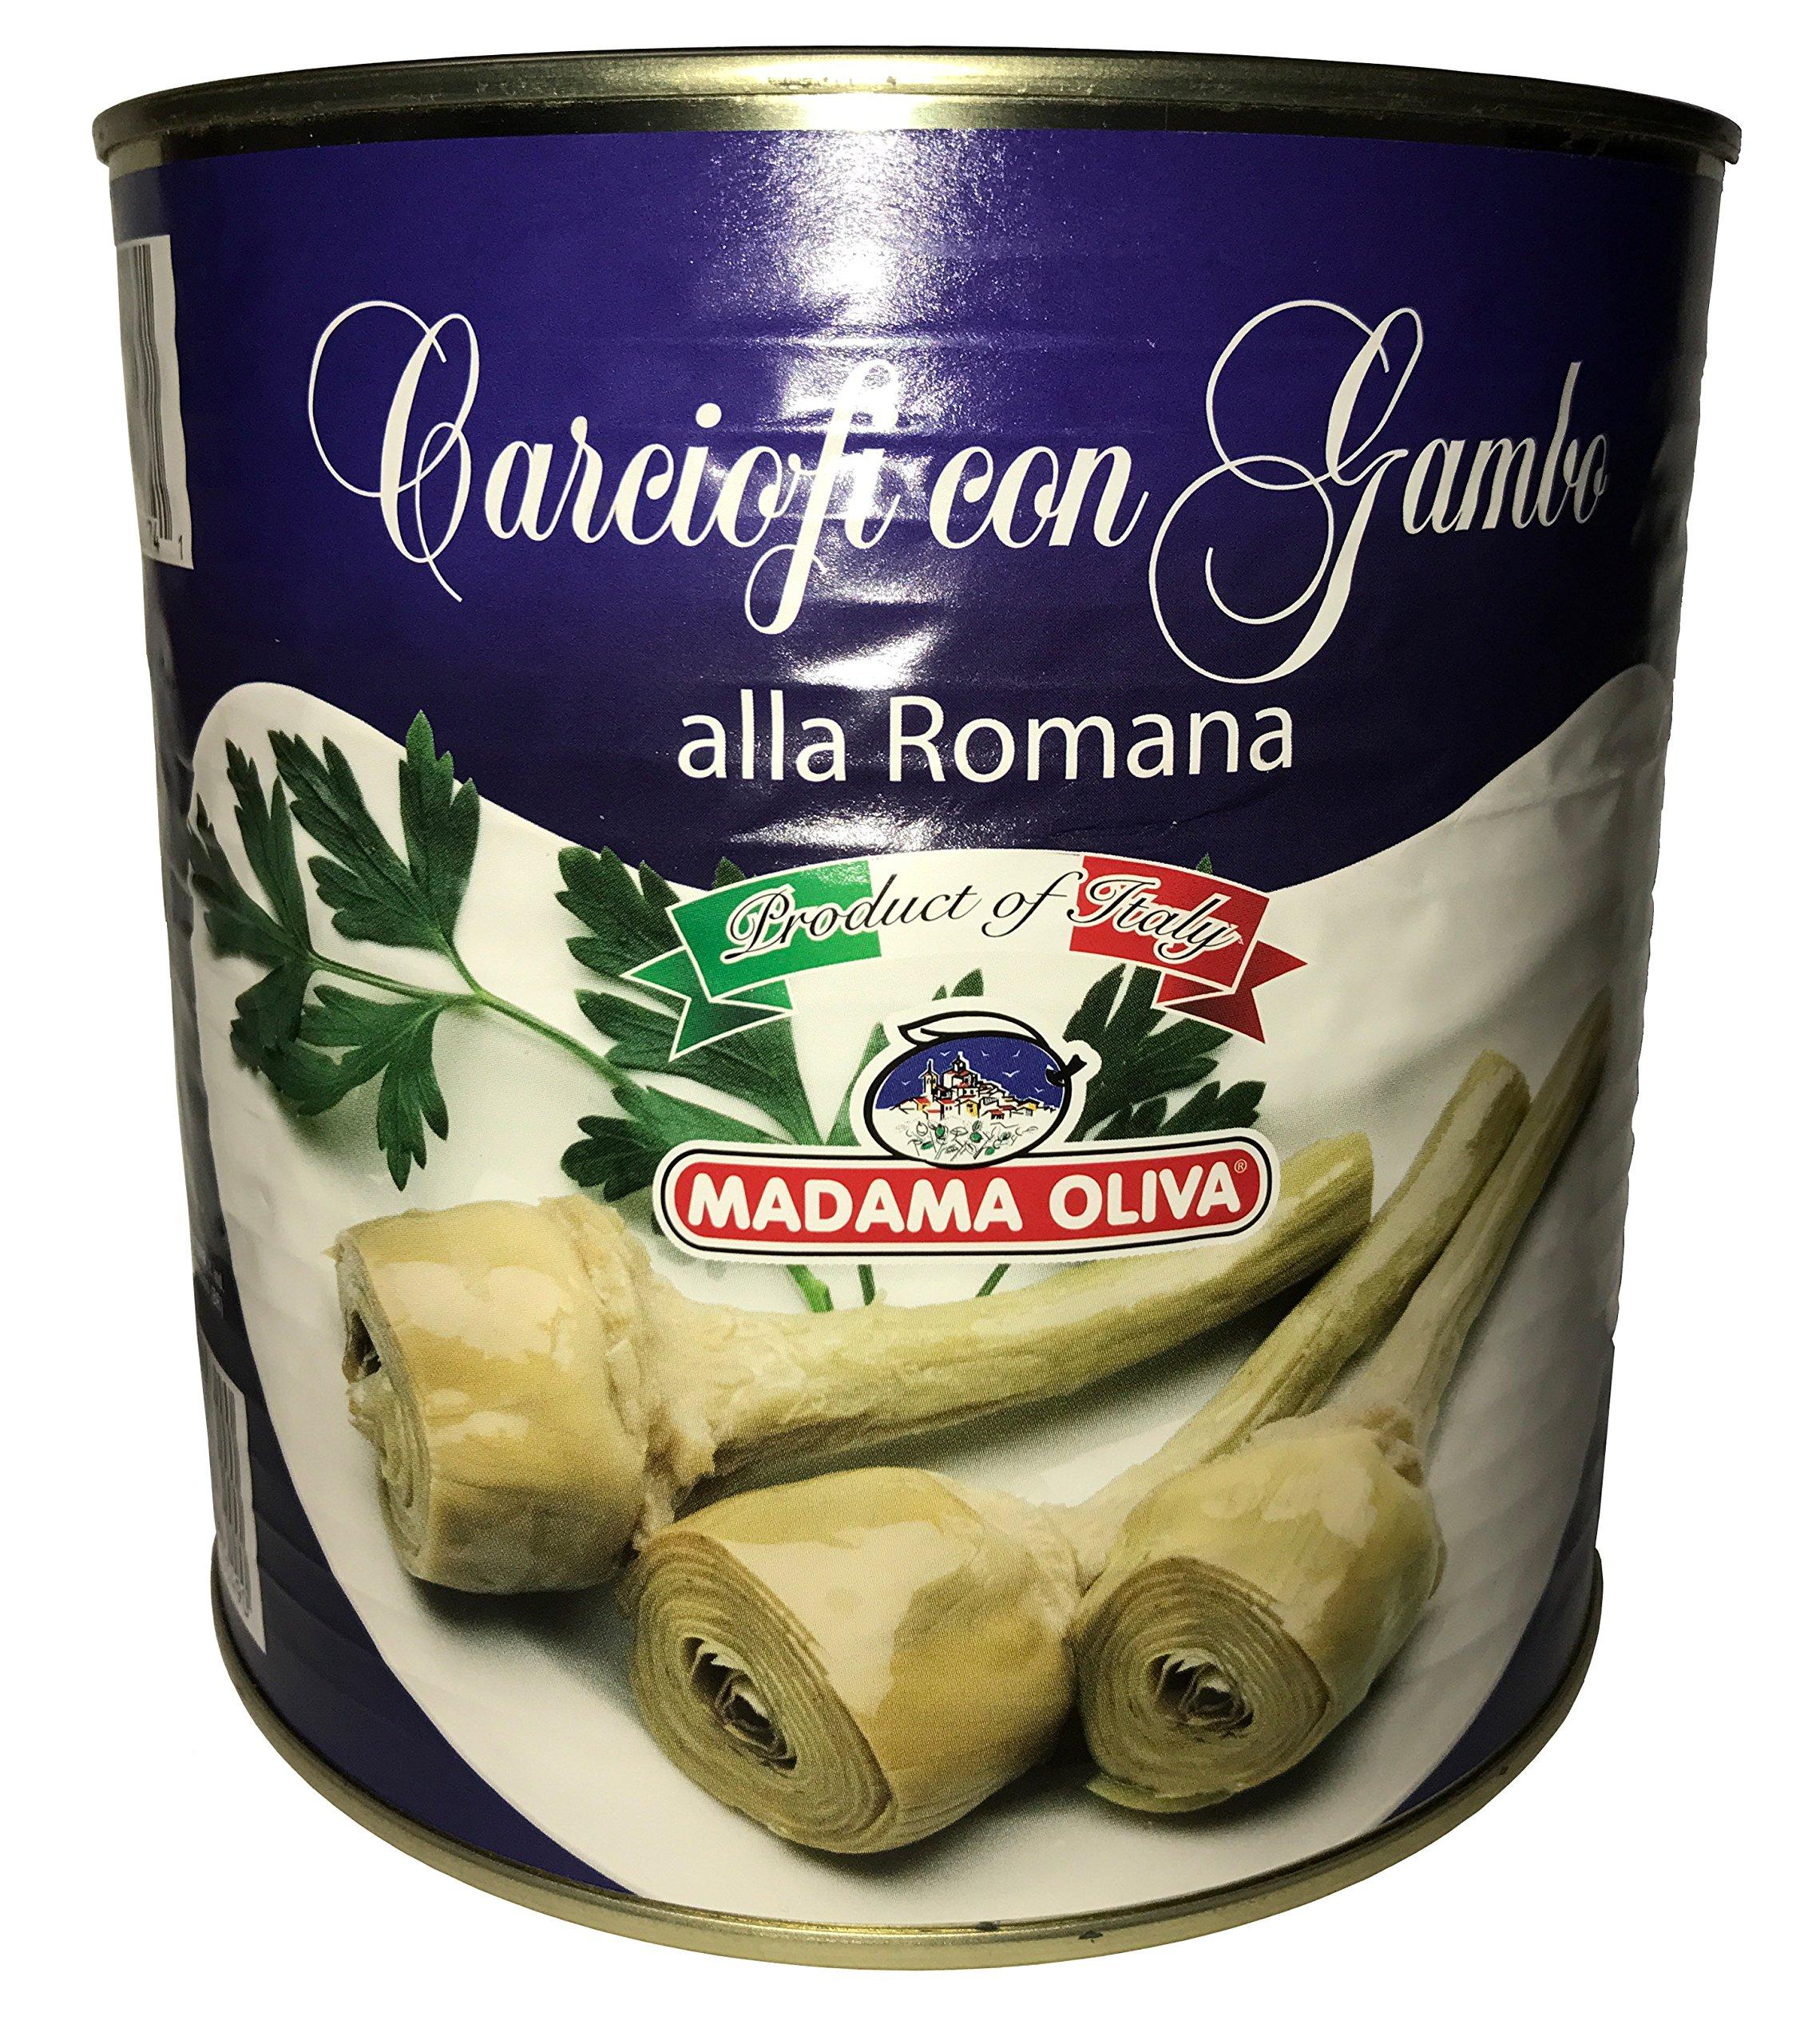 Madama Oliva Artichokes with a Stem Roman Style 5 Lb Net Weight.